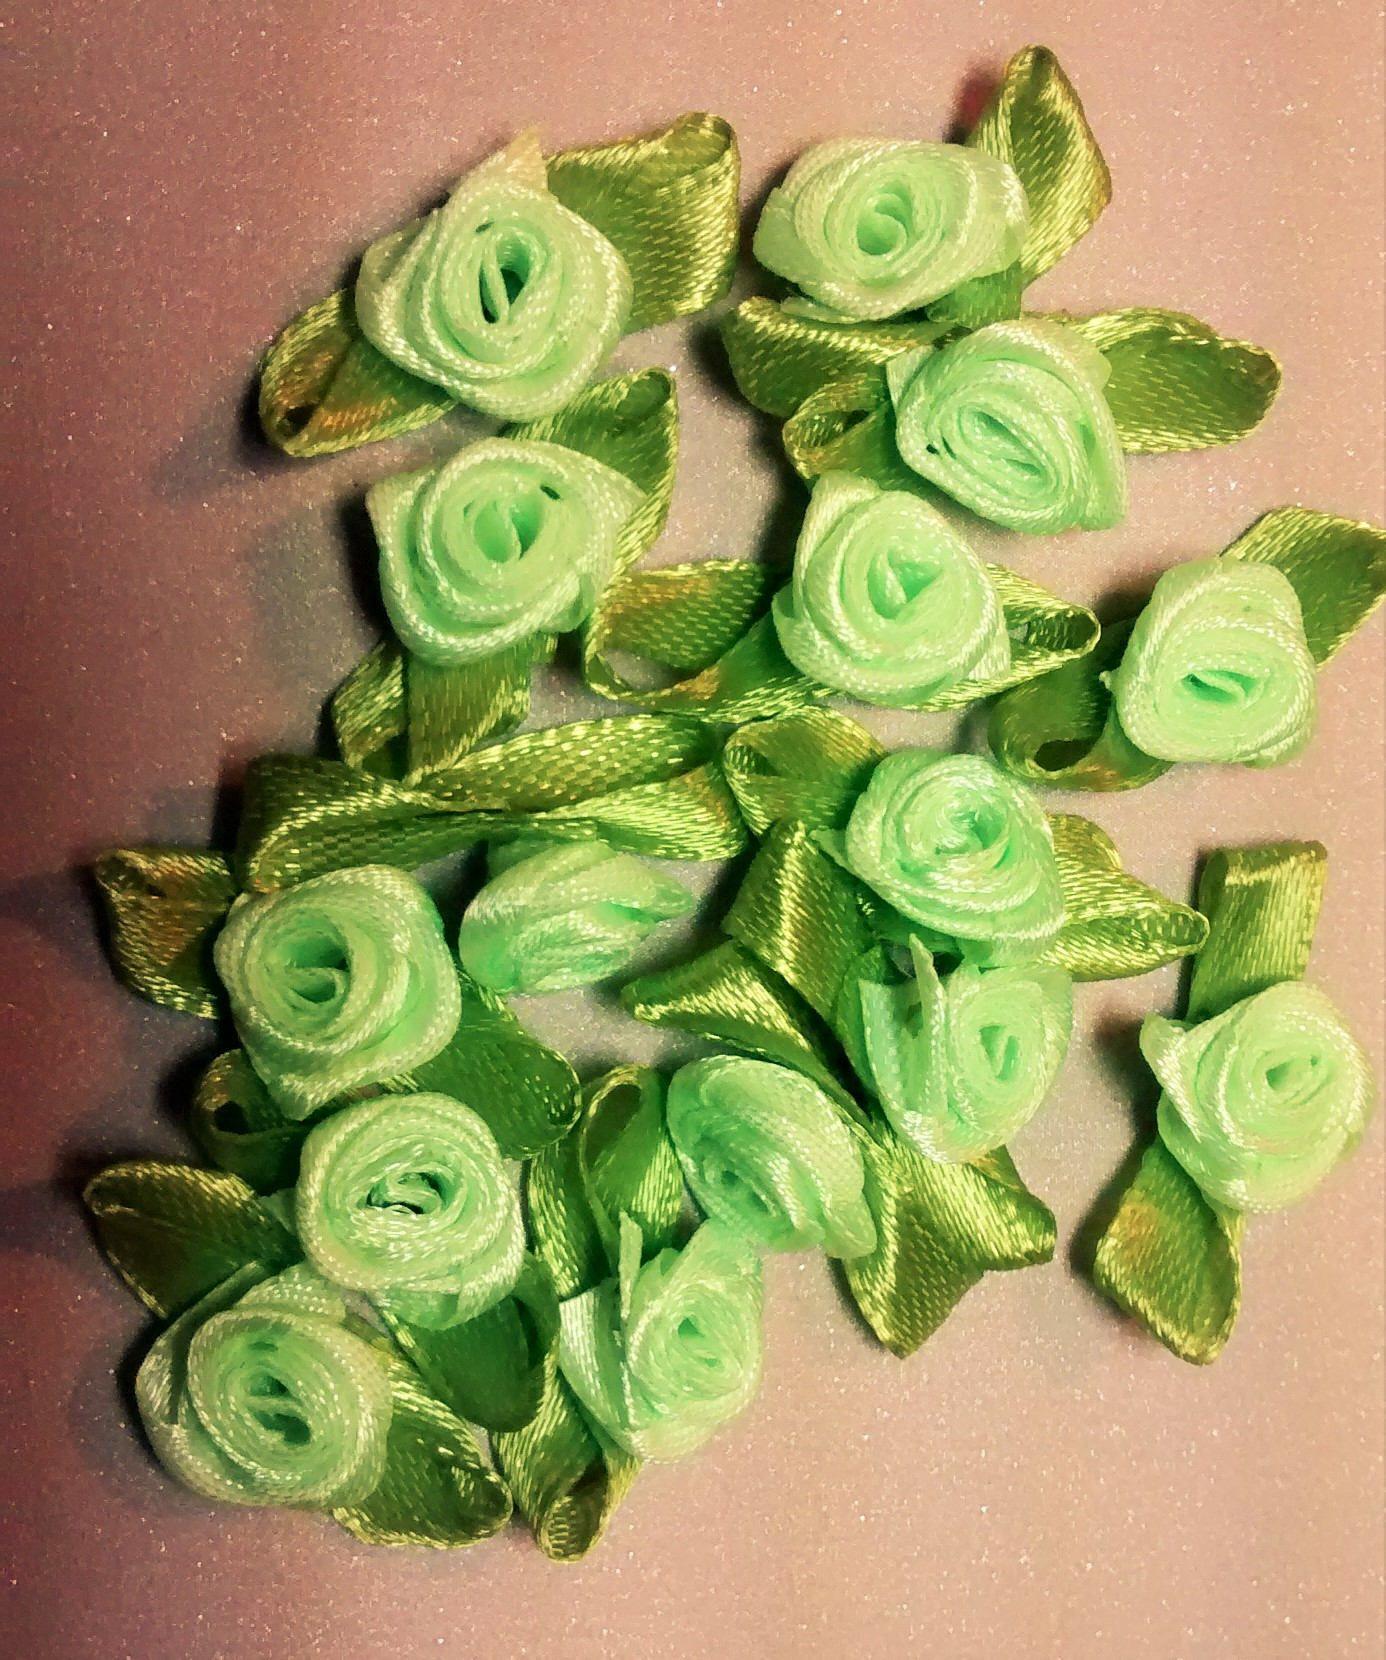 RR-106 $1.25 Light Green Ribbon Roses